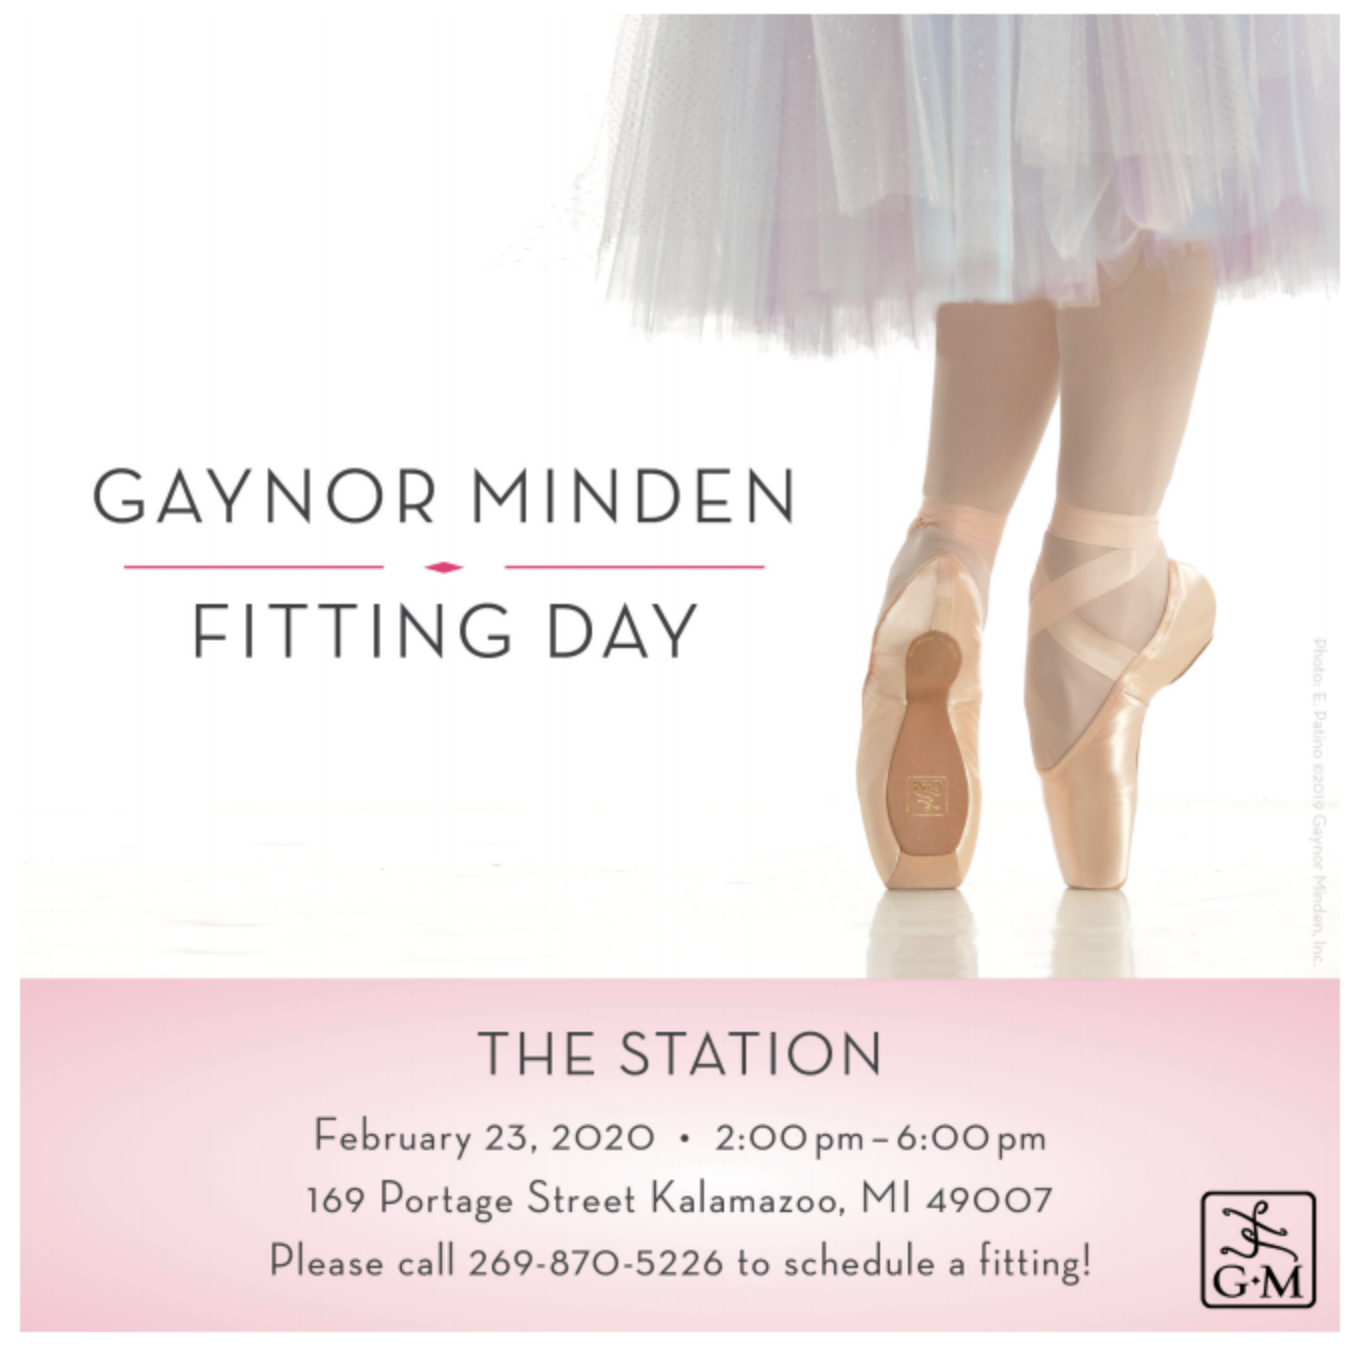 Gaynor Minden Fitting Day